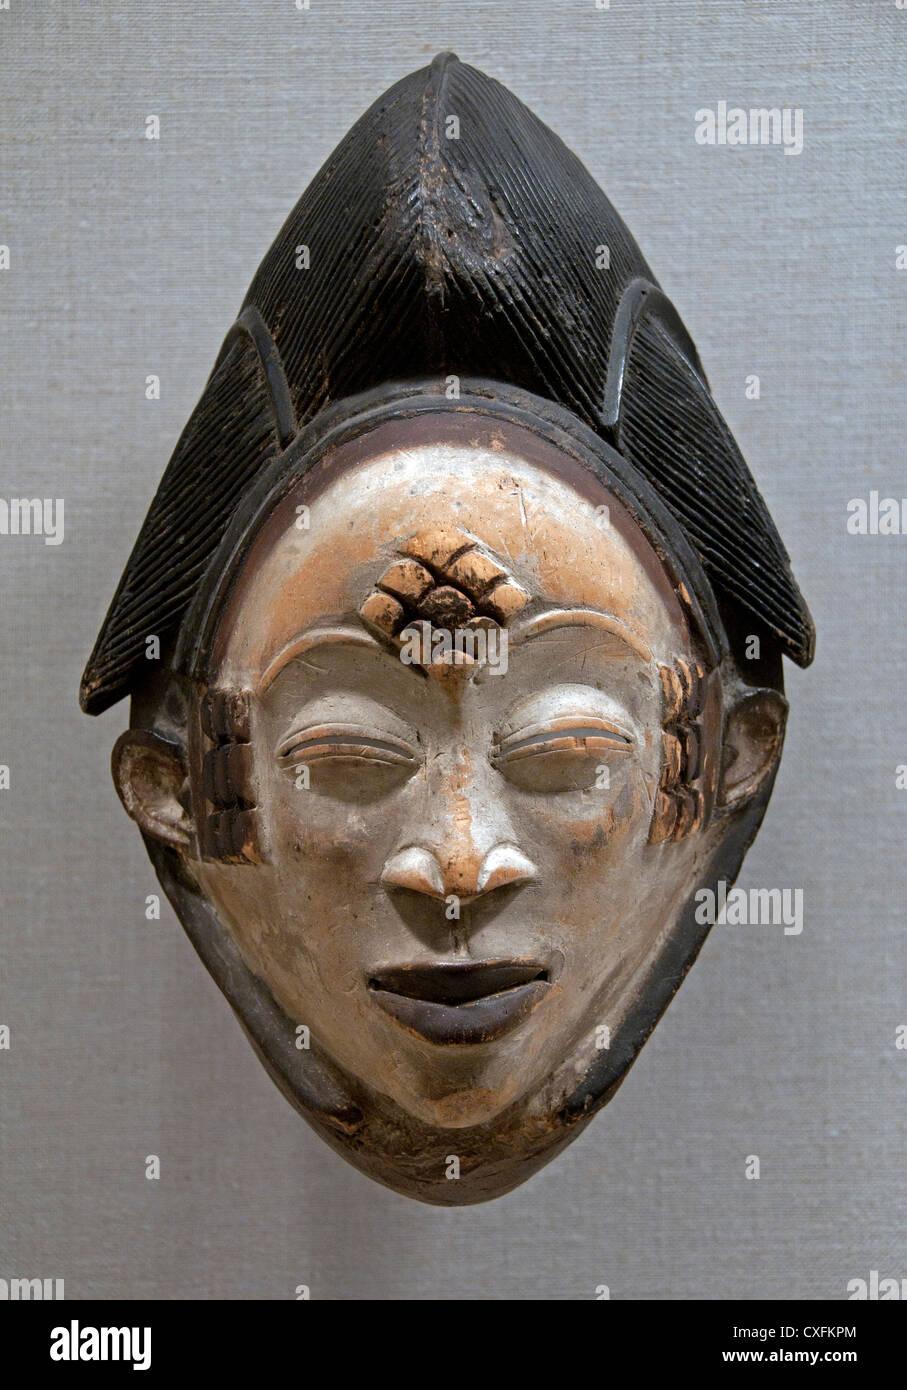 Mask Mukudj 19th century Gabon Ngounié River region Punu peoples 34 cm Africa - Stock Image